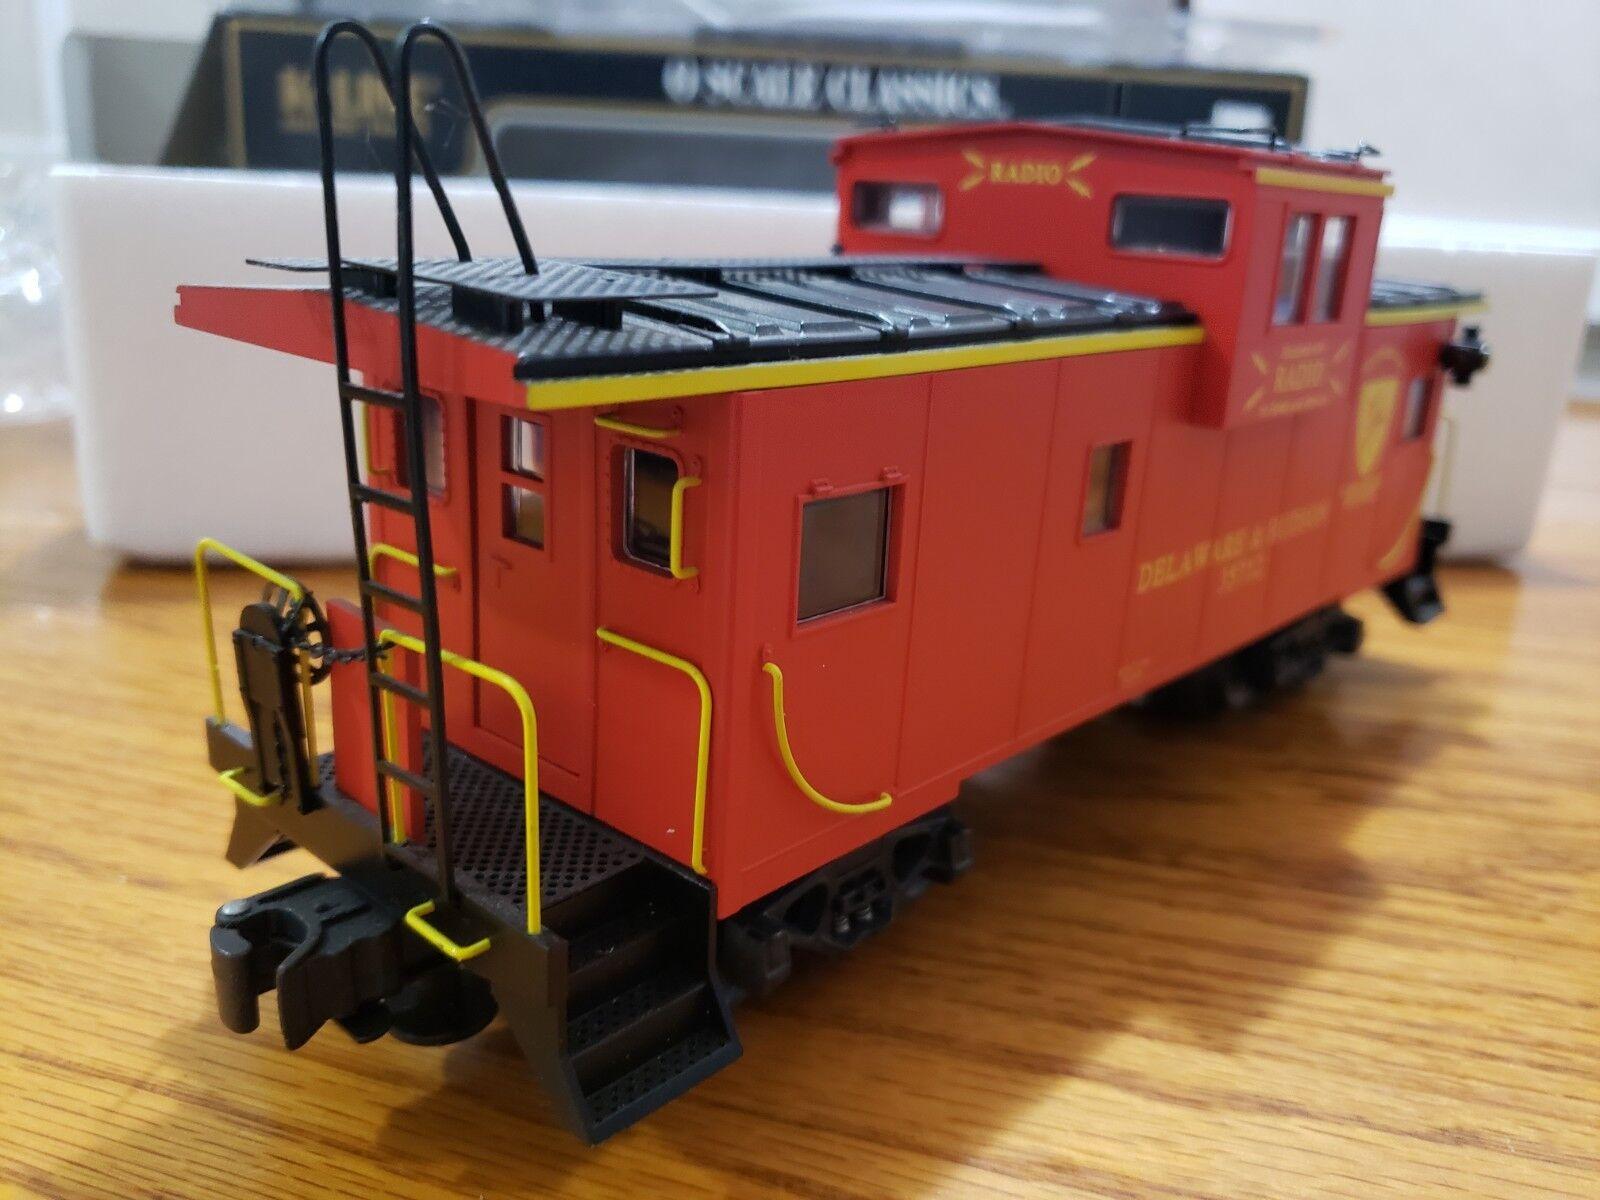 K-Line Delaware & Hudson radio visión extendida furgón de cola 0 escala O27 K613-1541